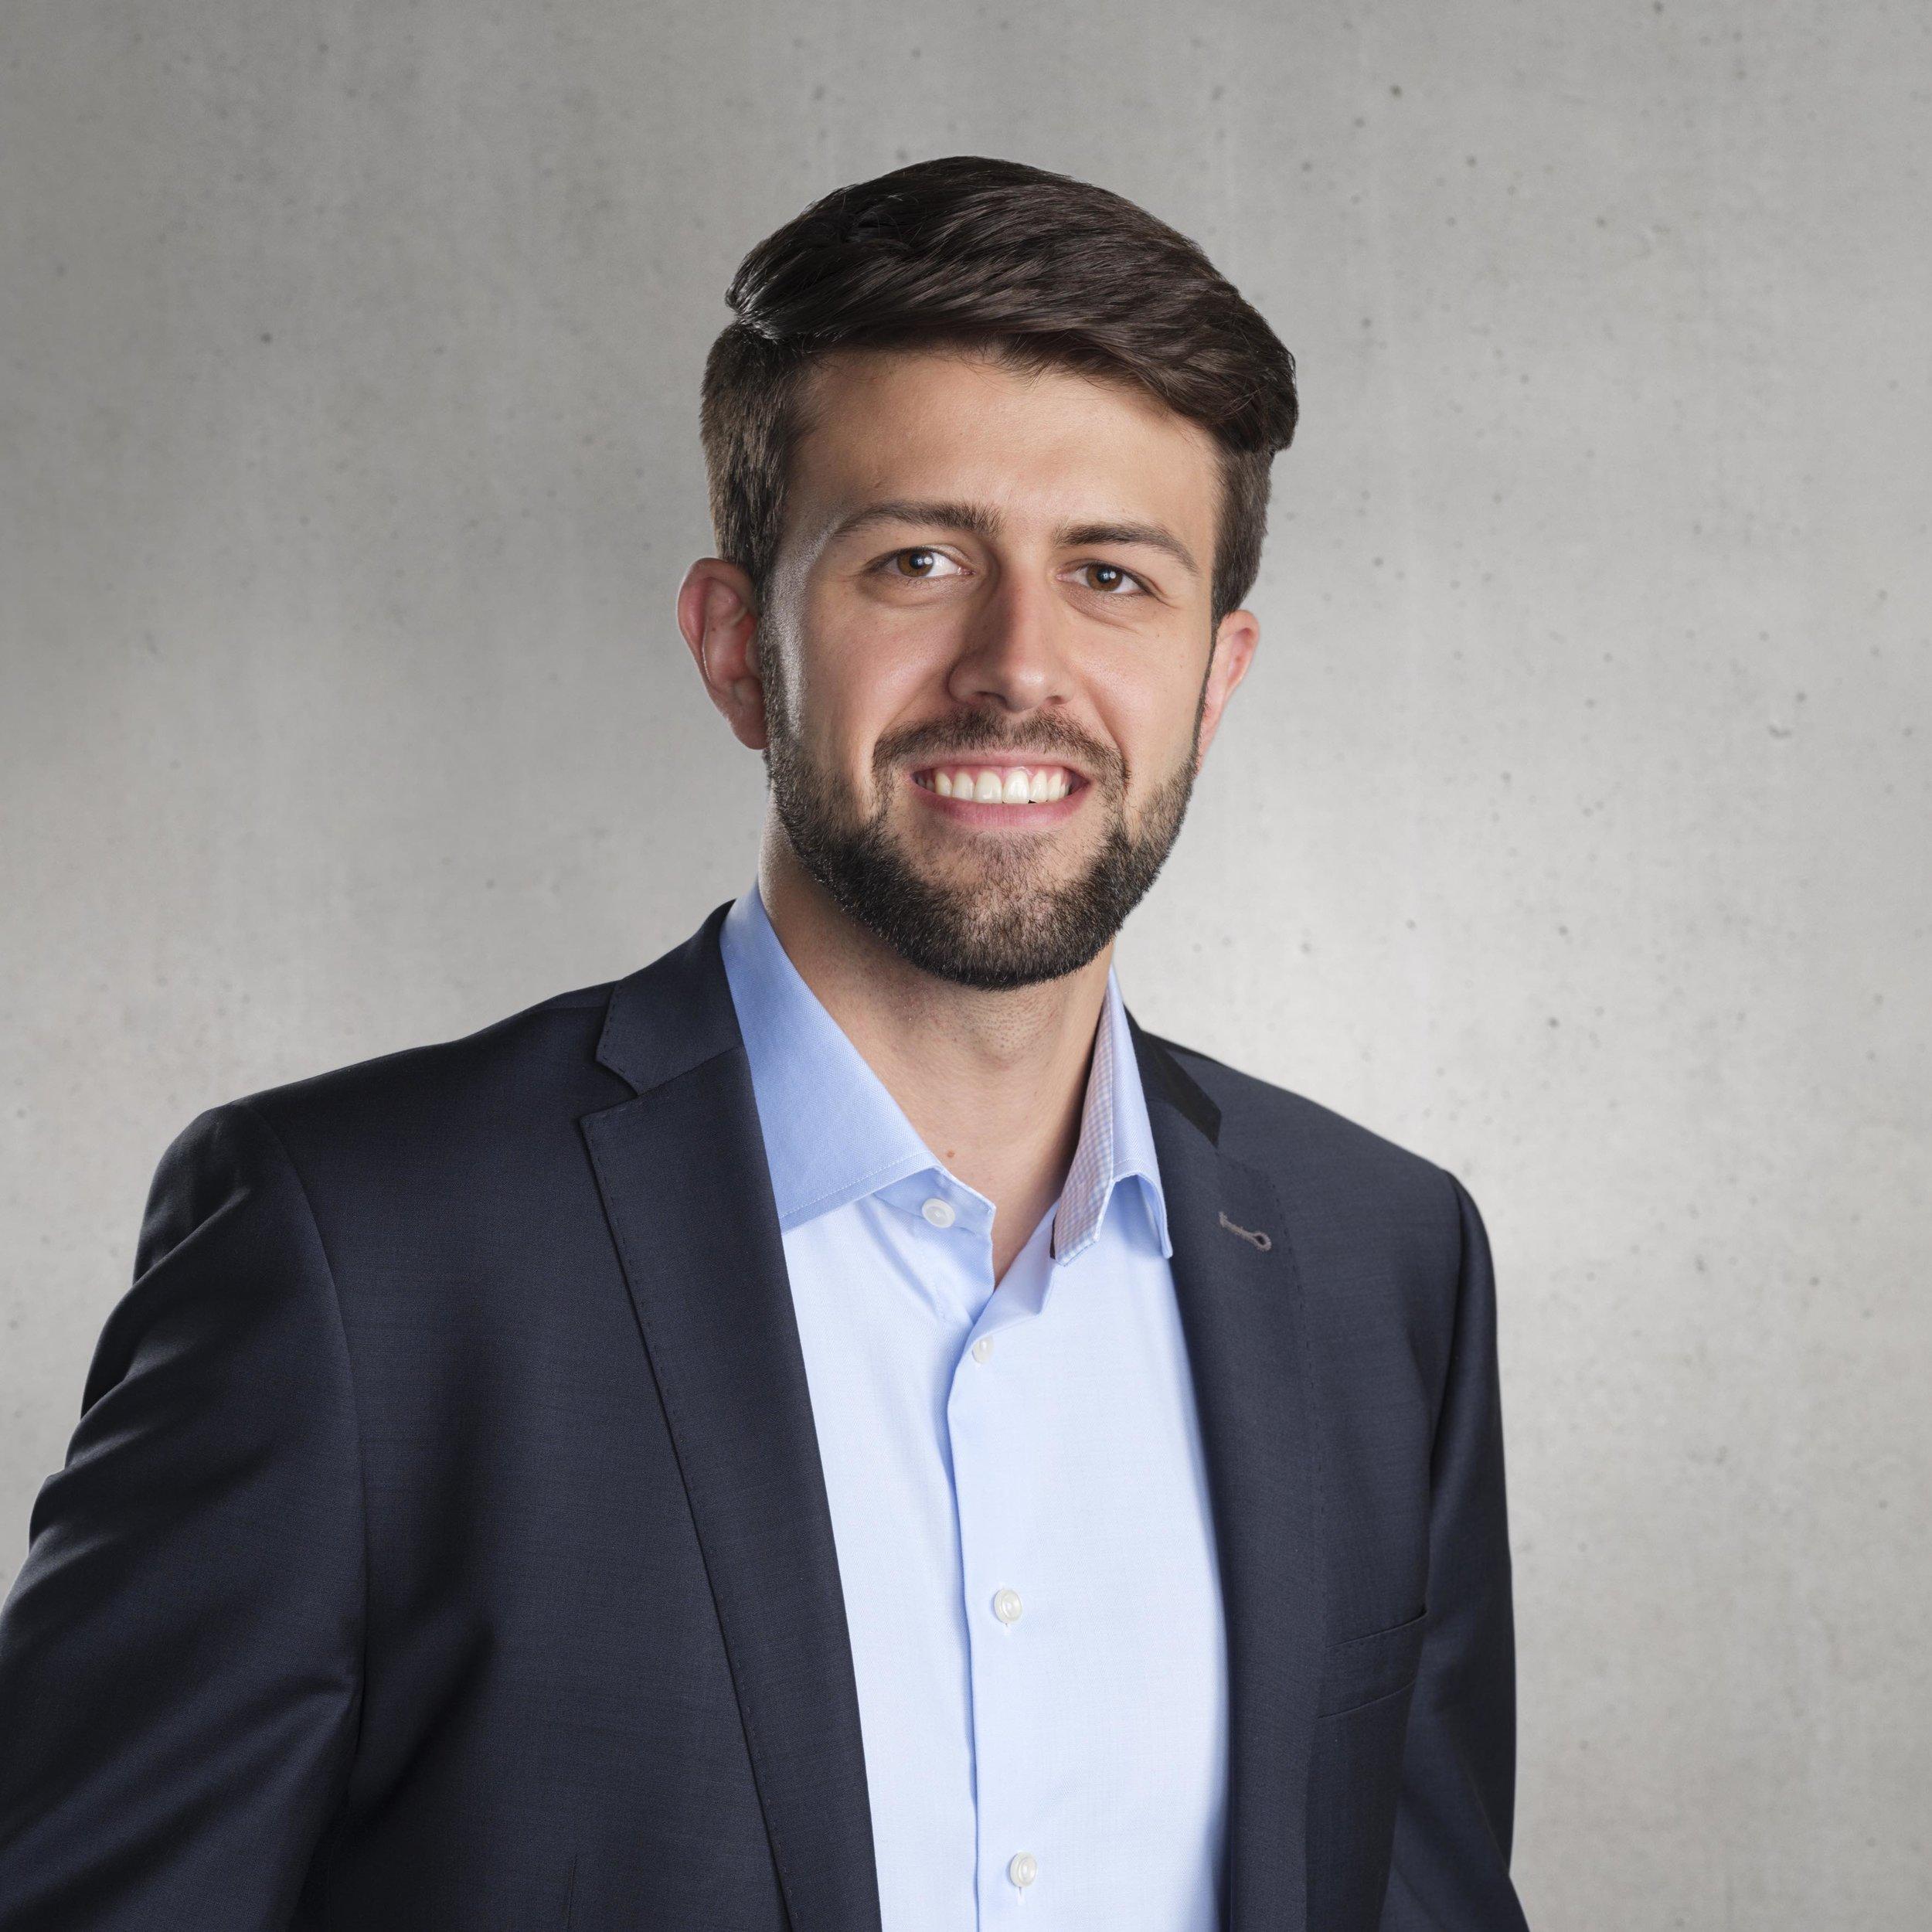 Sandro Balduini - Investment Solutionsemail: sandro.balduini@anovapartners.comdirect no.: +41 44 215 24 71